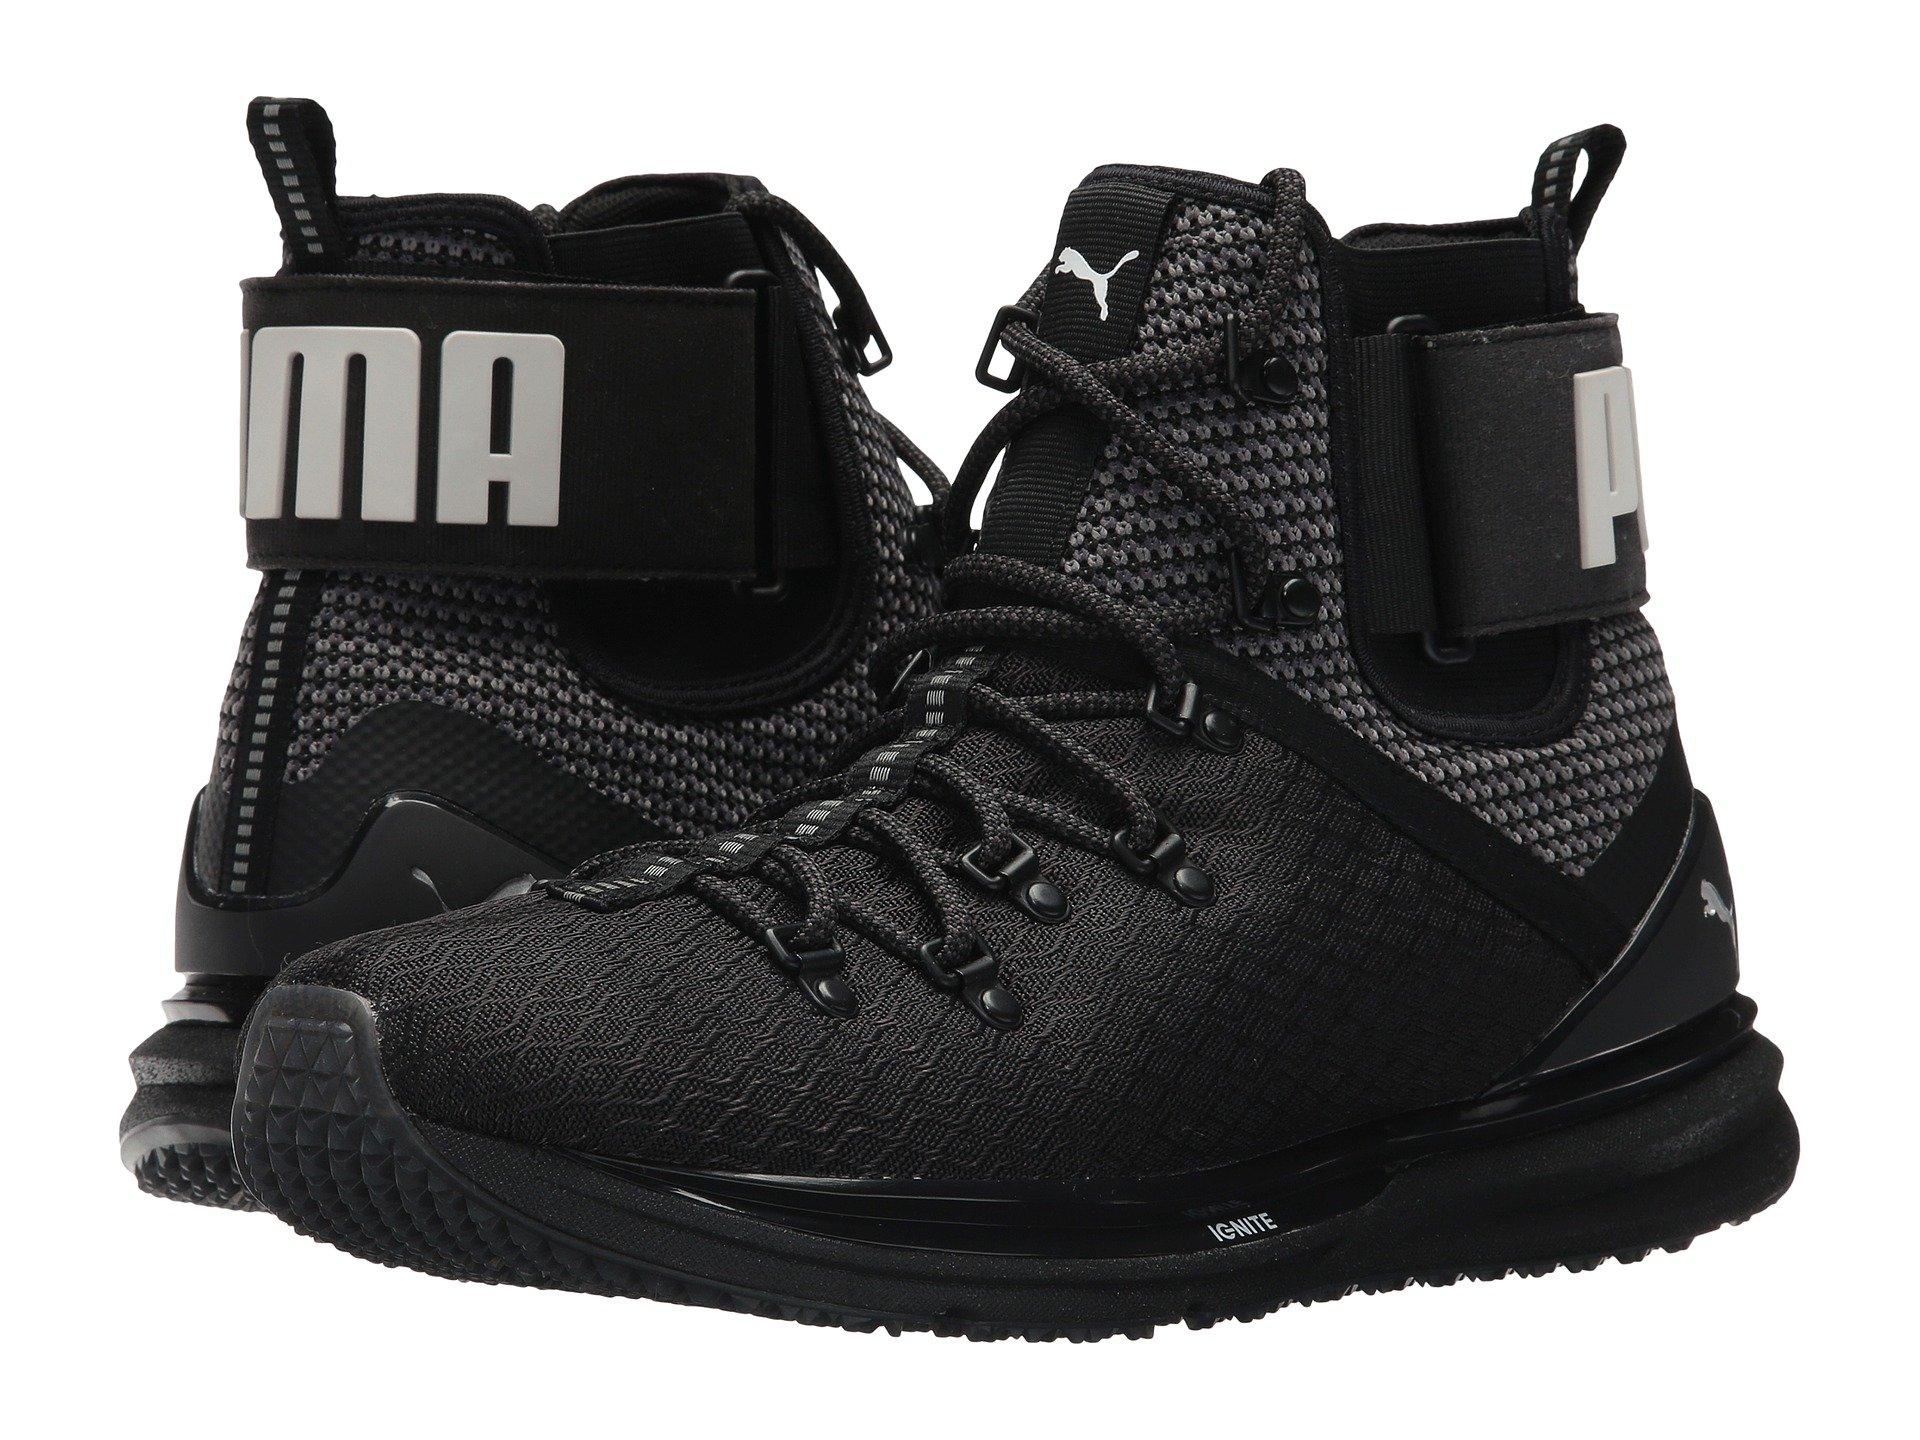 Botas para Hombre PUMA Ignite Limitless Boot  + PUMA en VeoyCompro.net